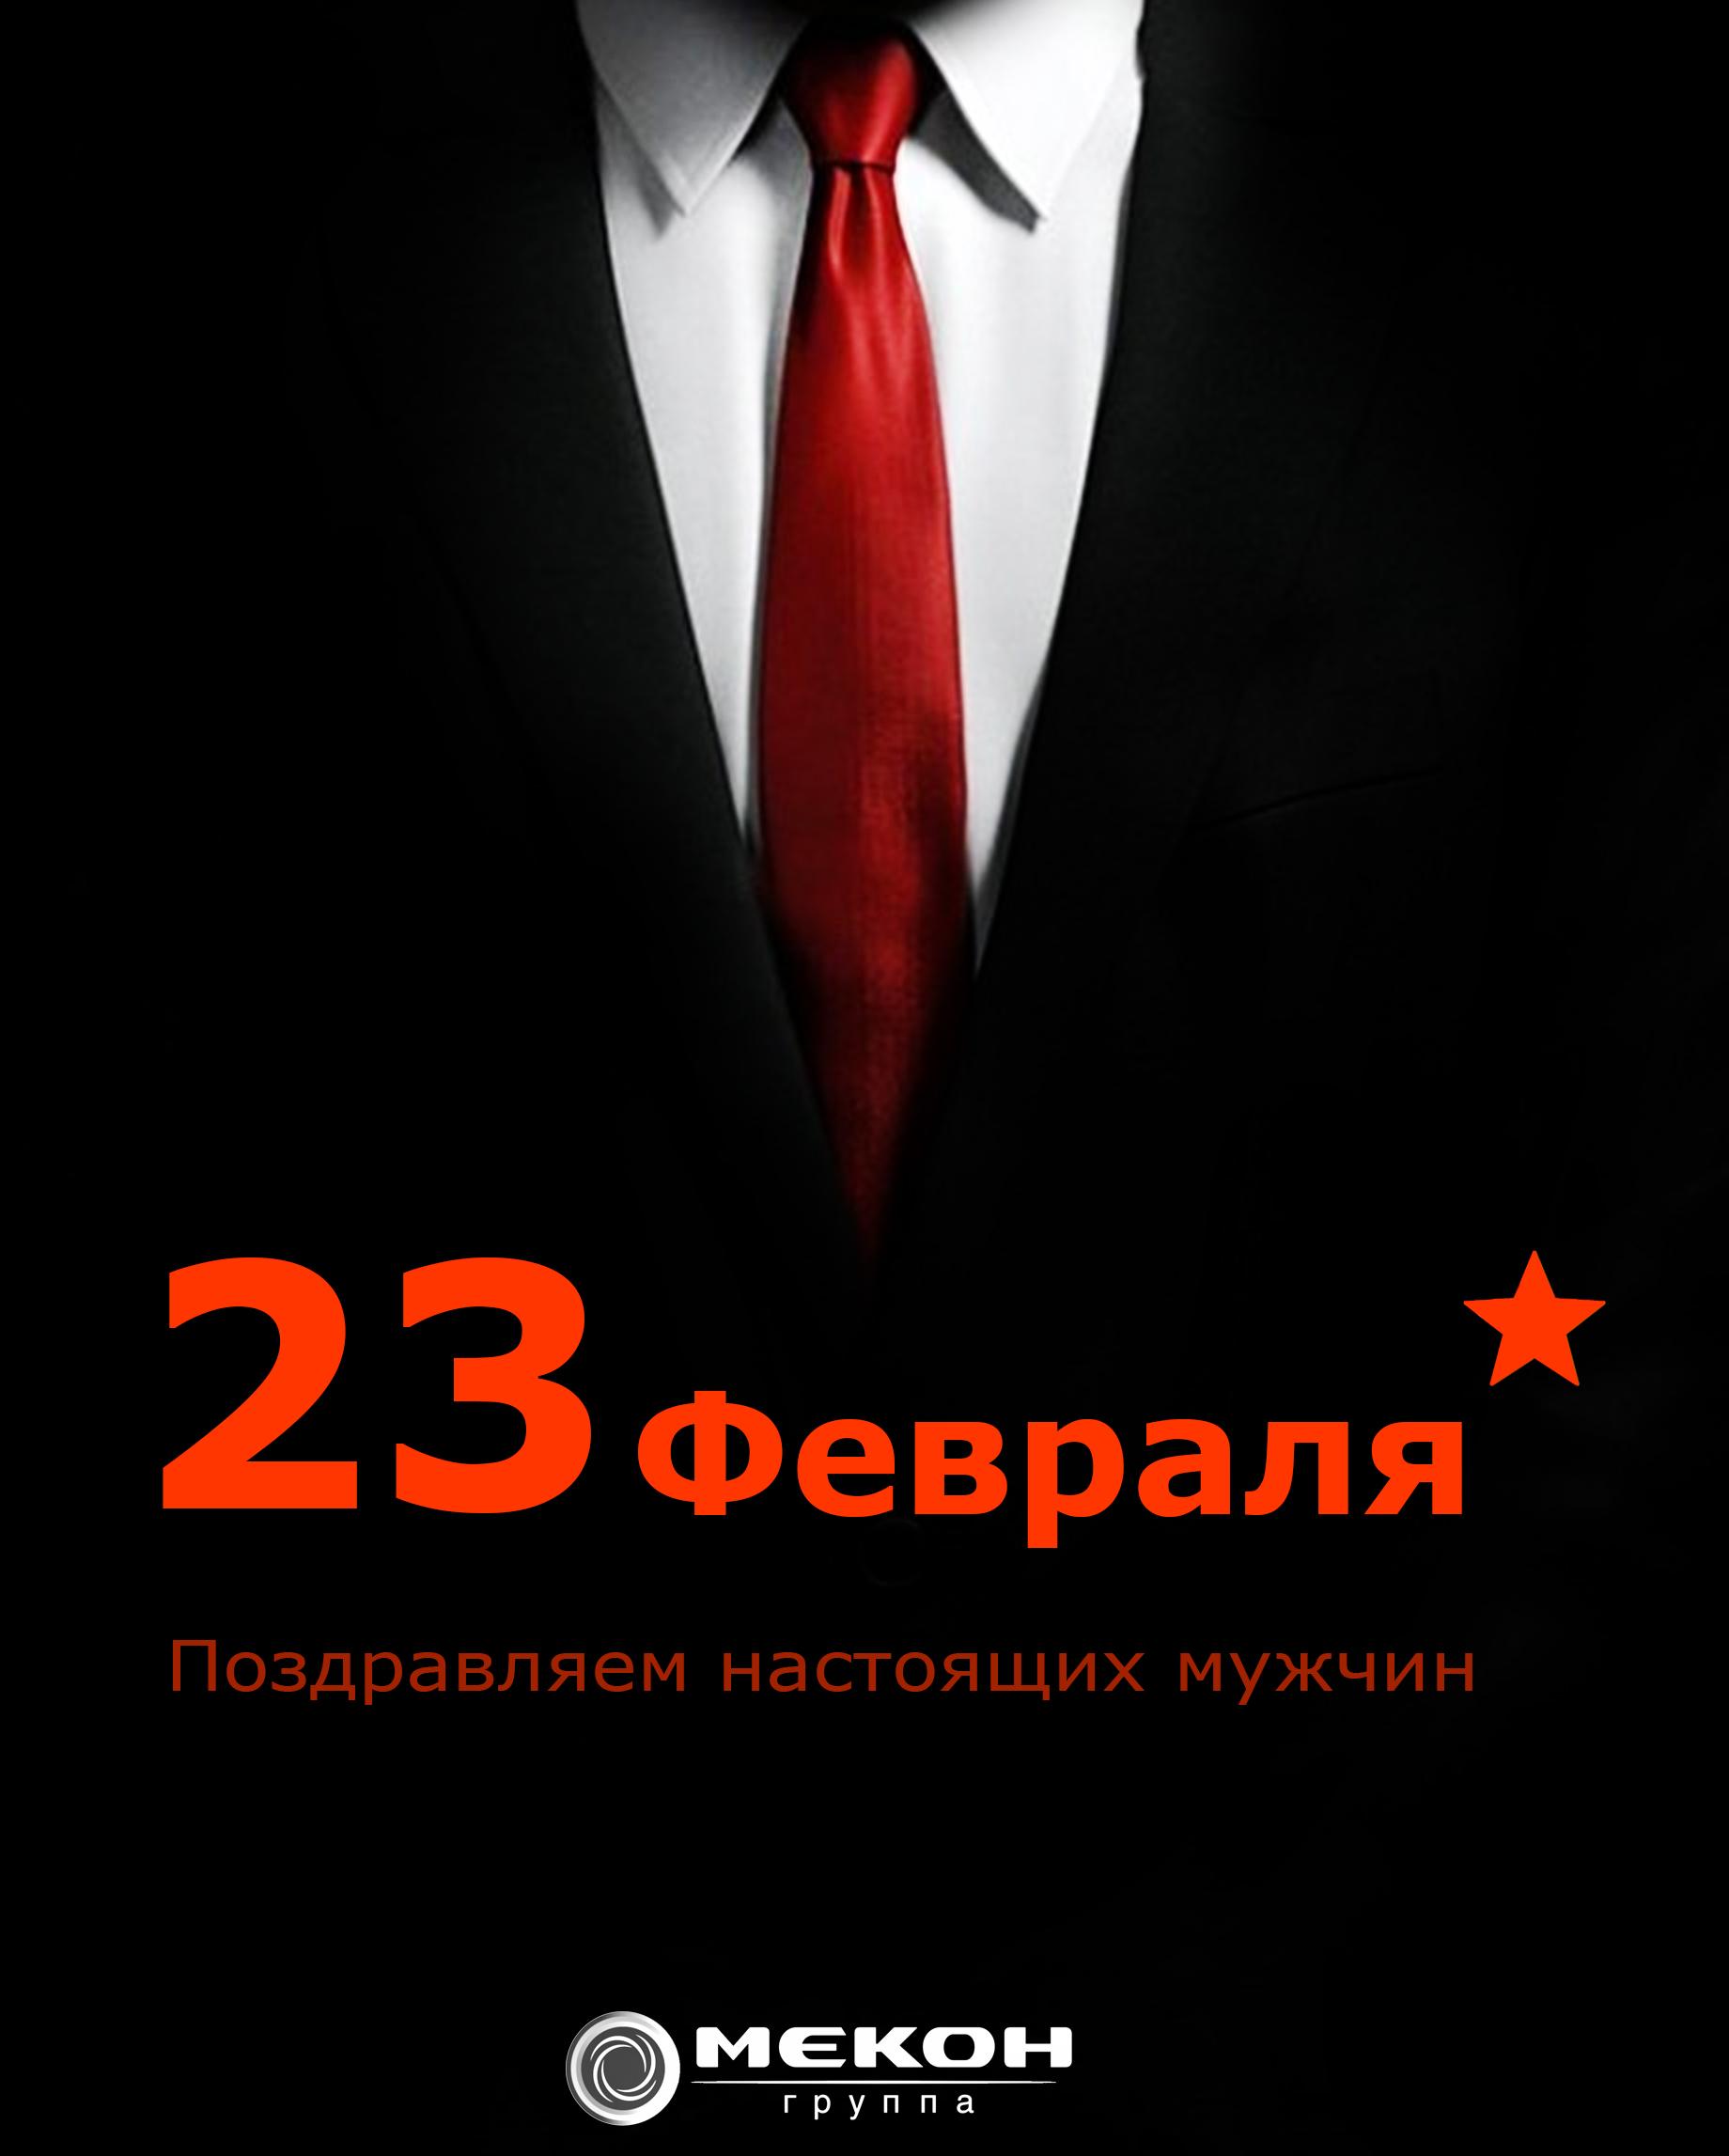 Открытки с 23 февраля от мужчине мужчине, открытки мужчине